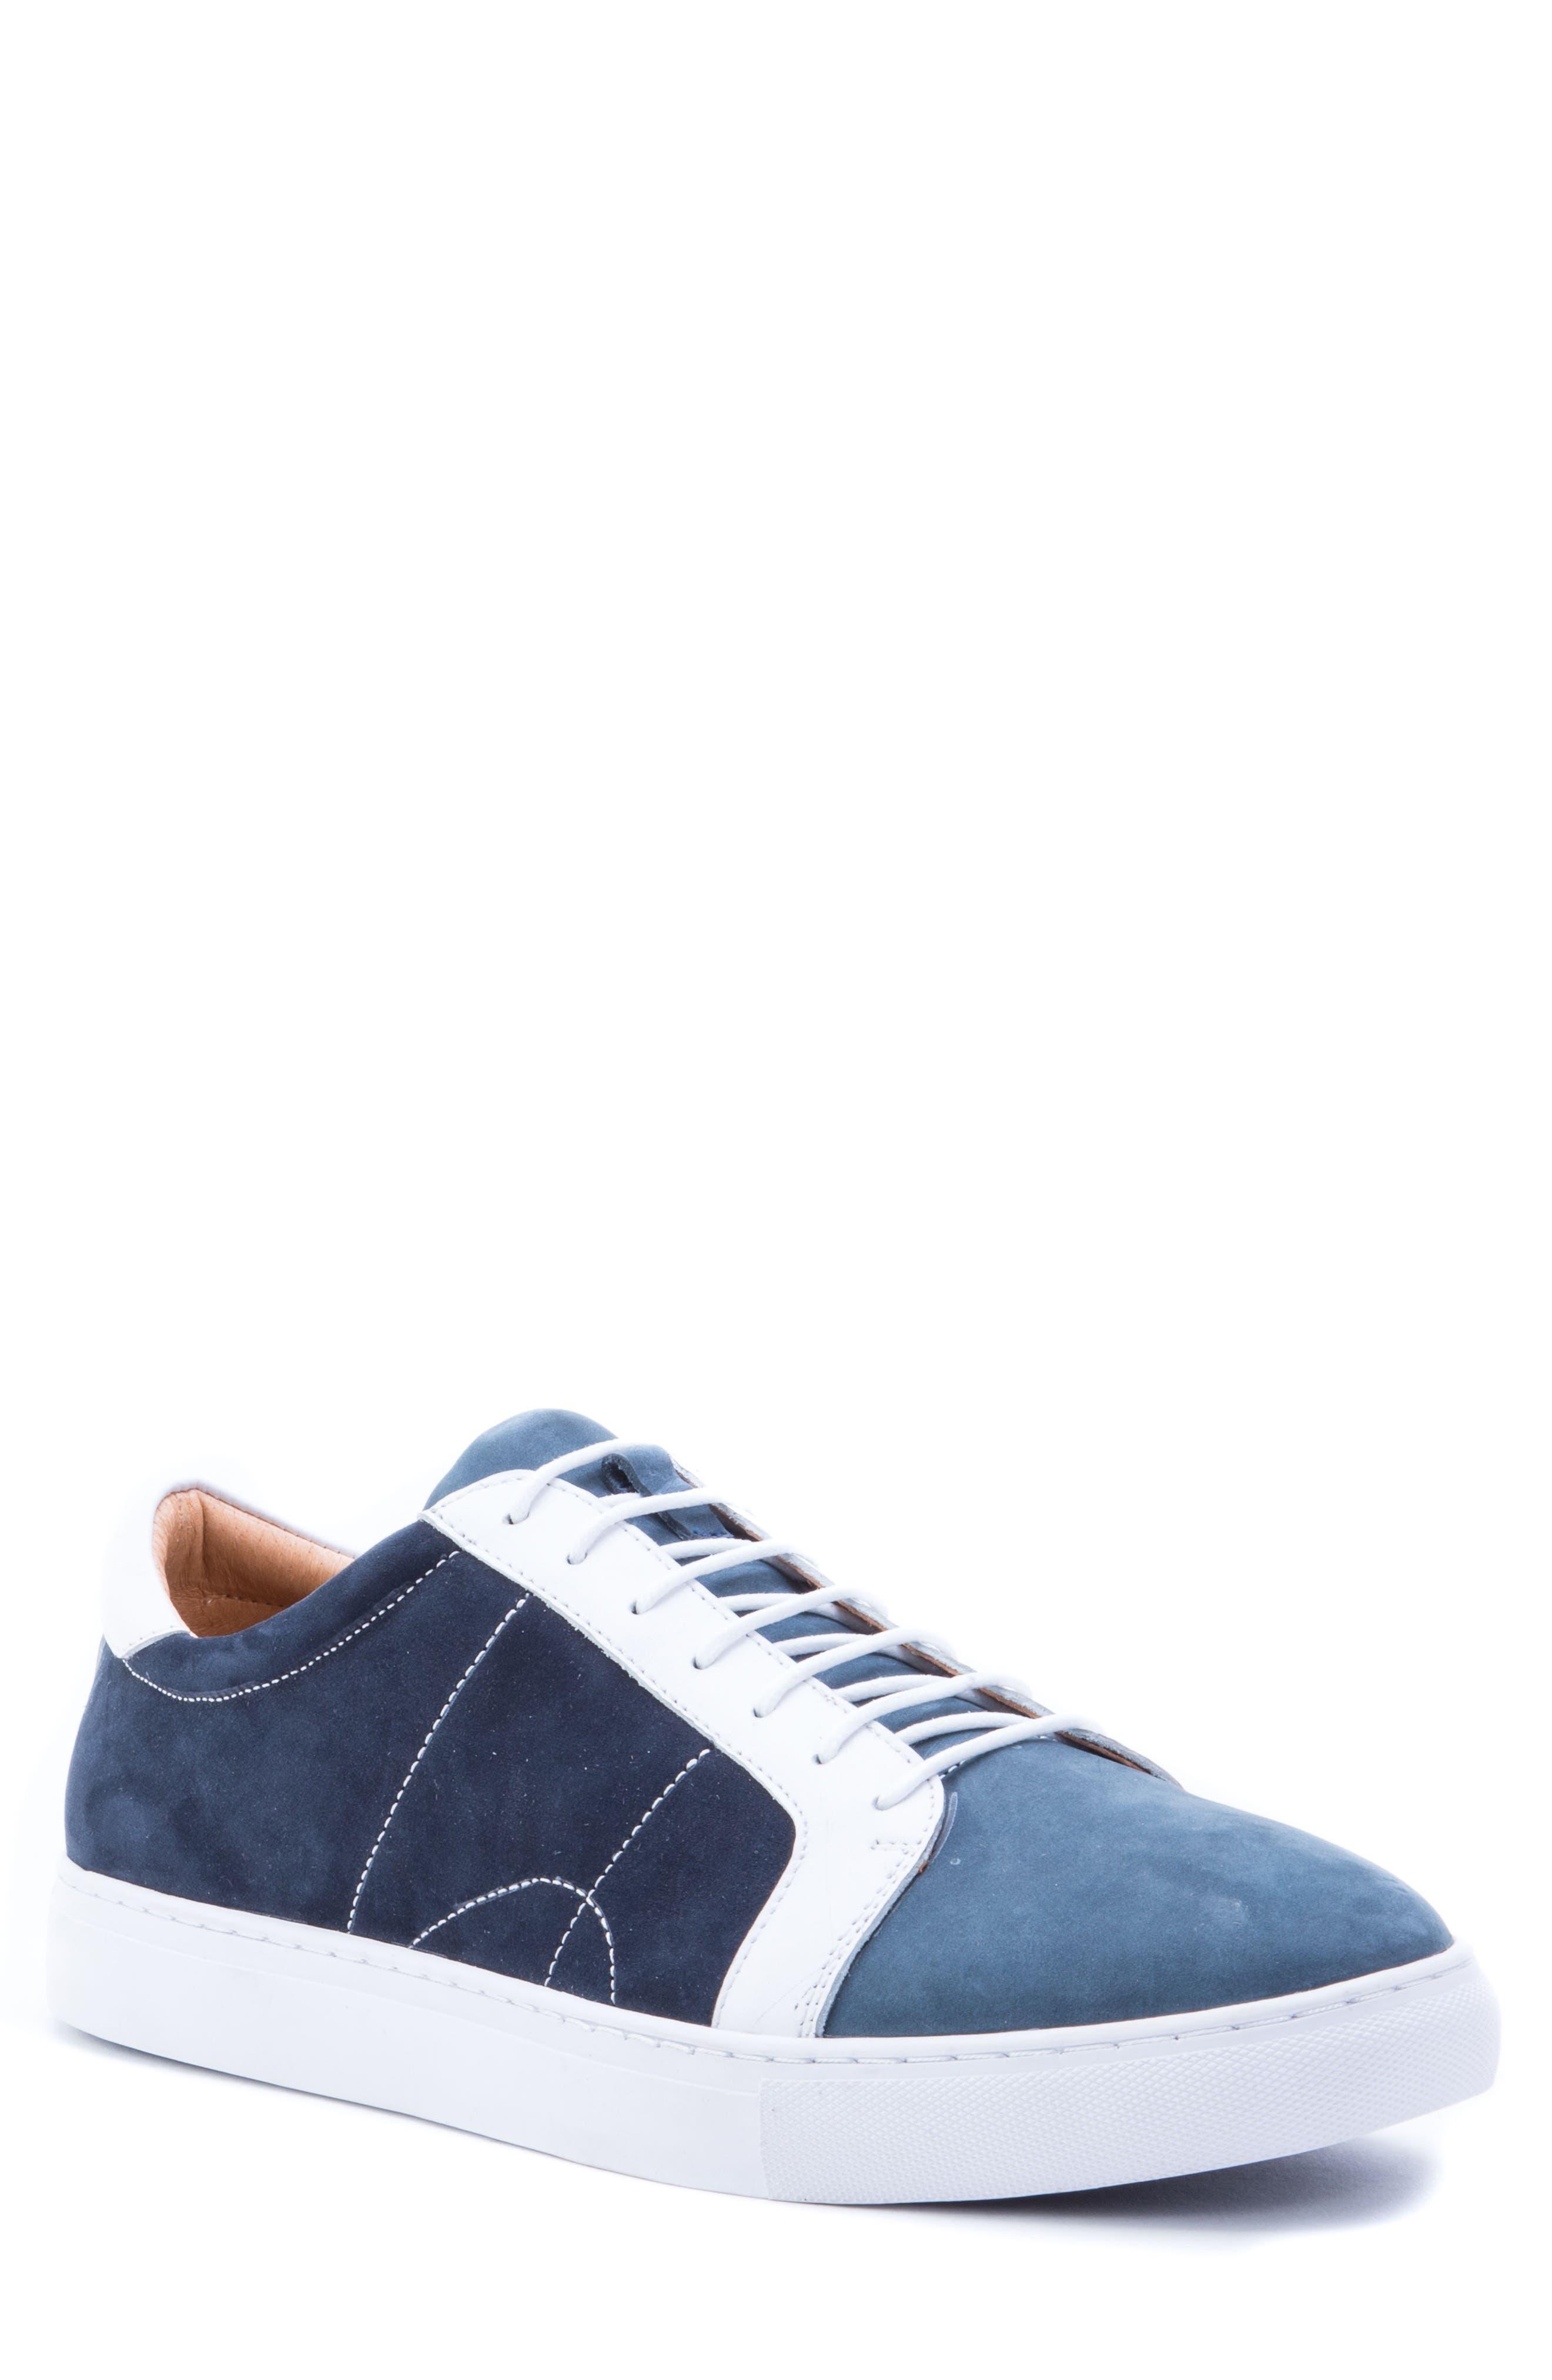 Gonzalo Low Top Sneaker,                         Main,                         color, Navy Suede